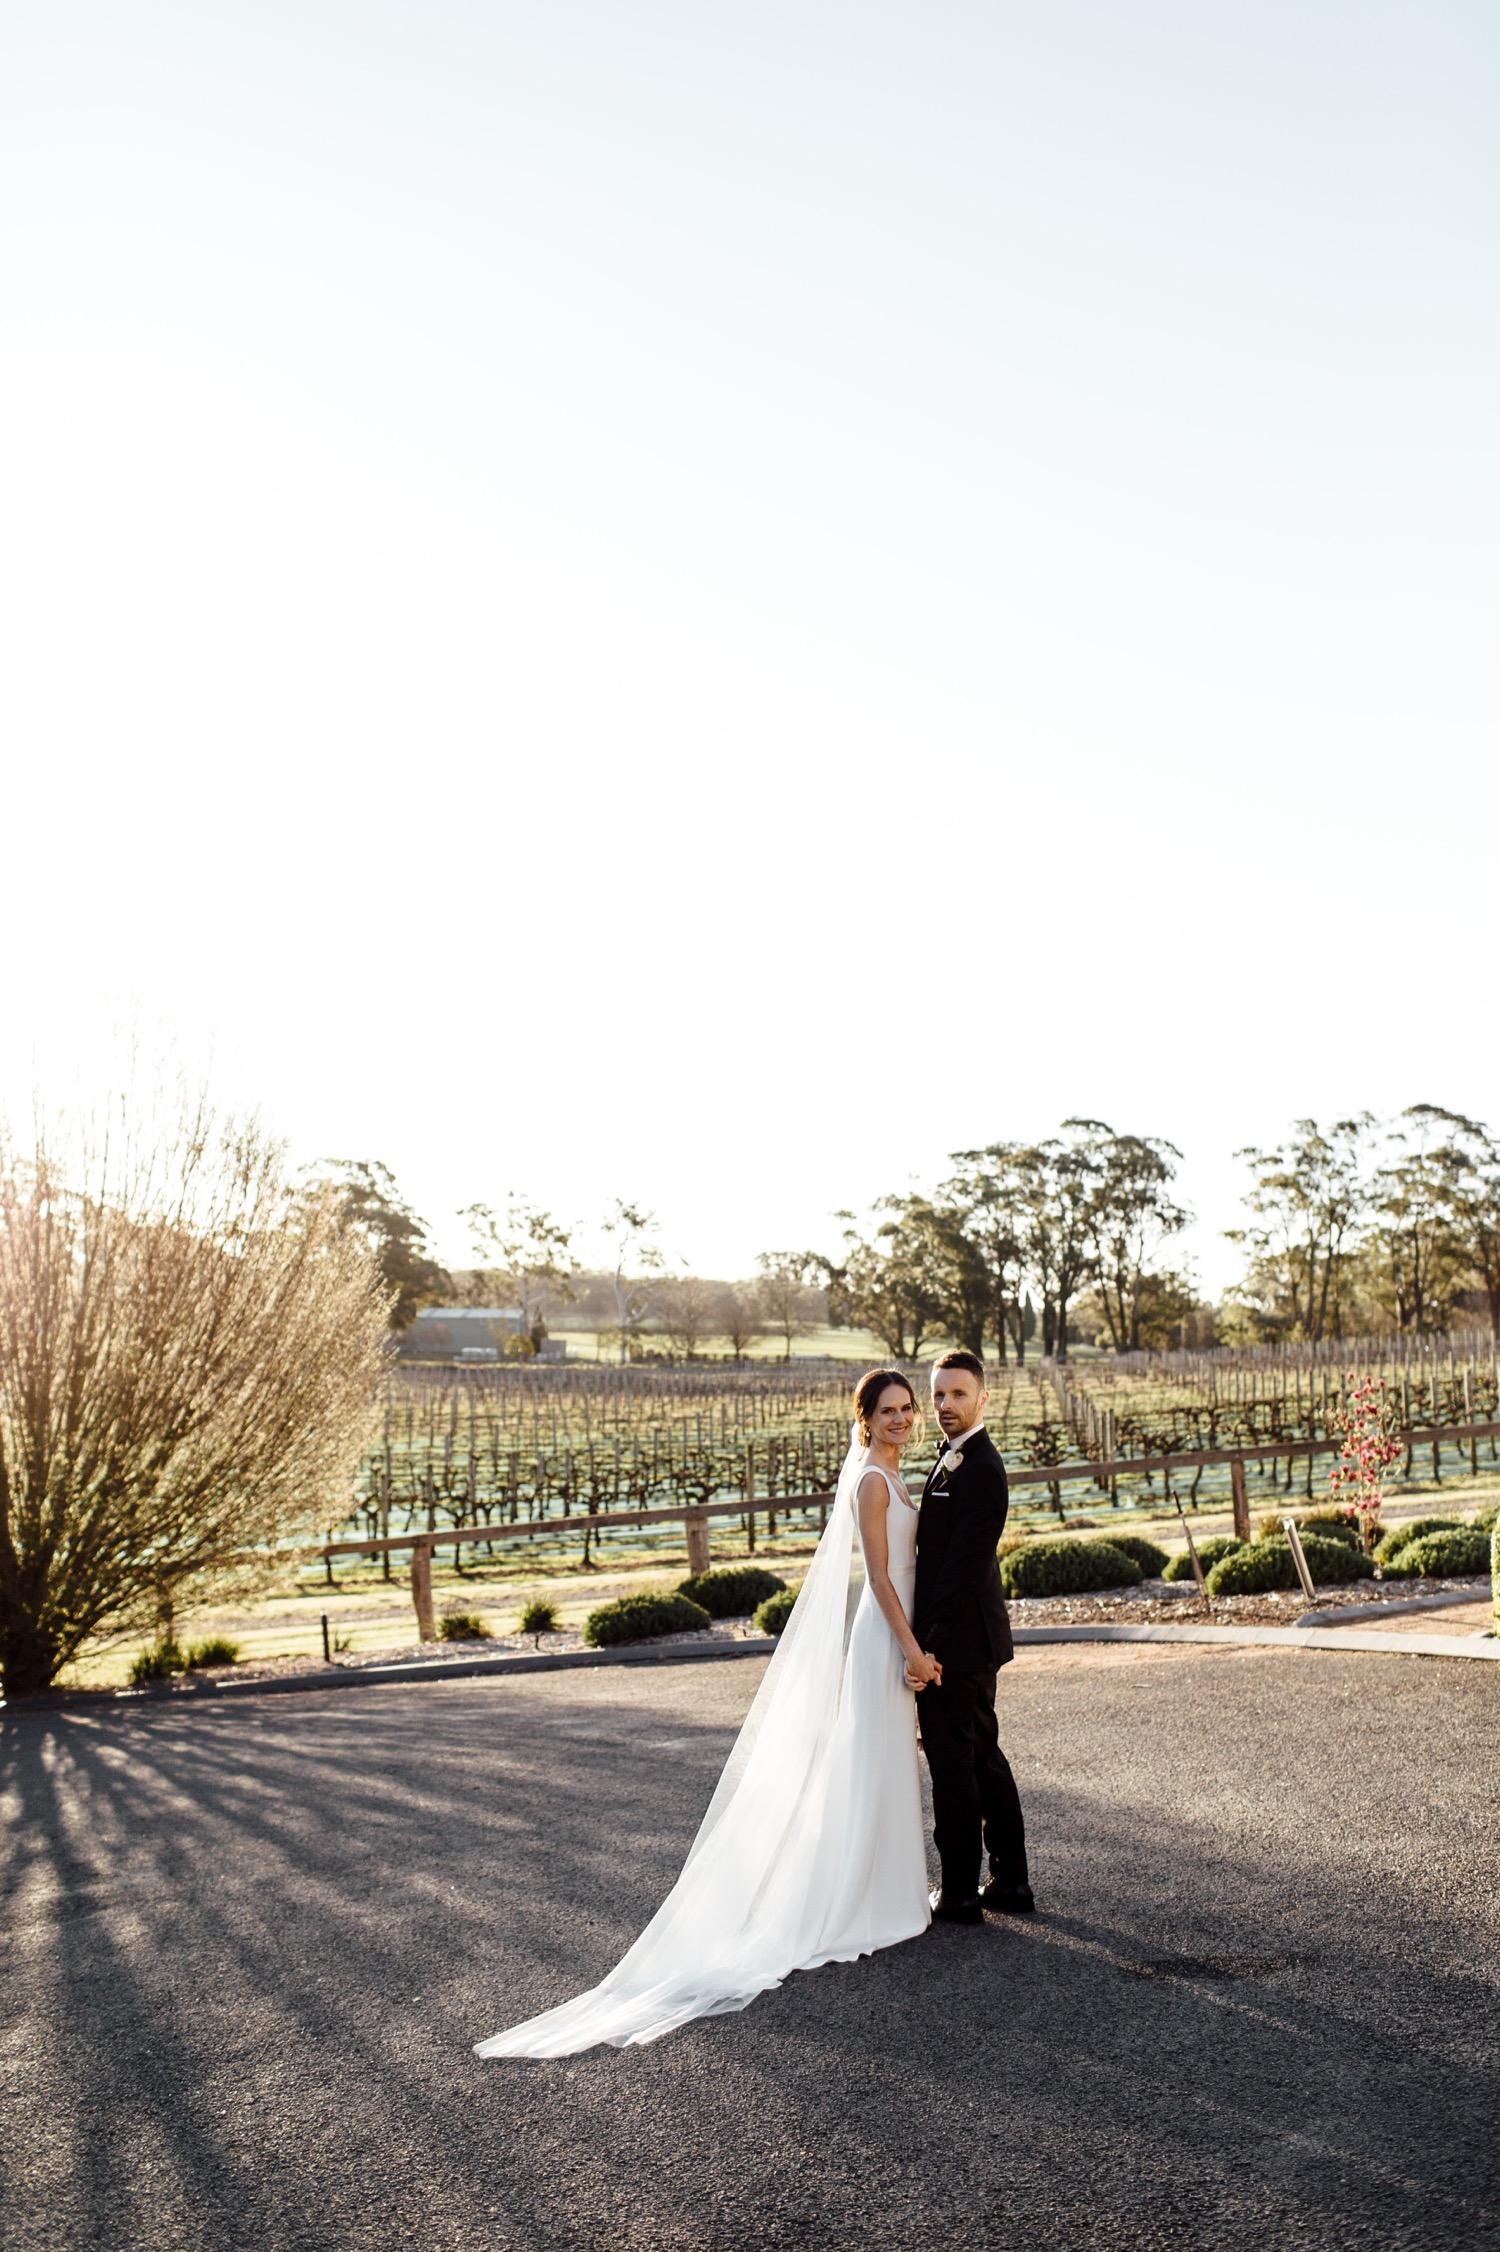 Centennial vineyards wedding photography